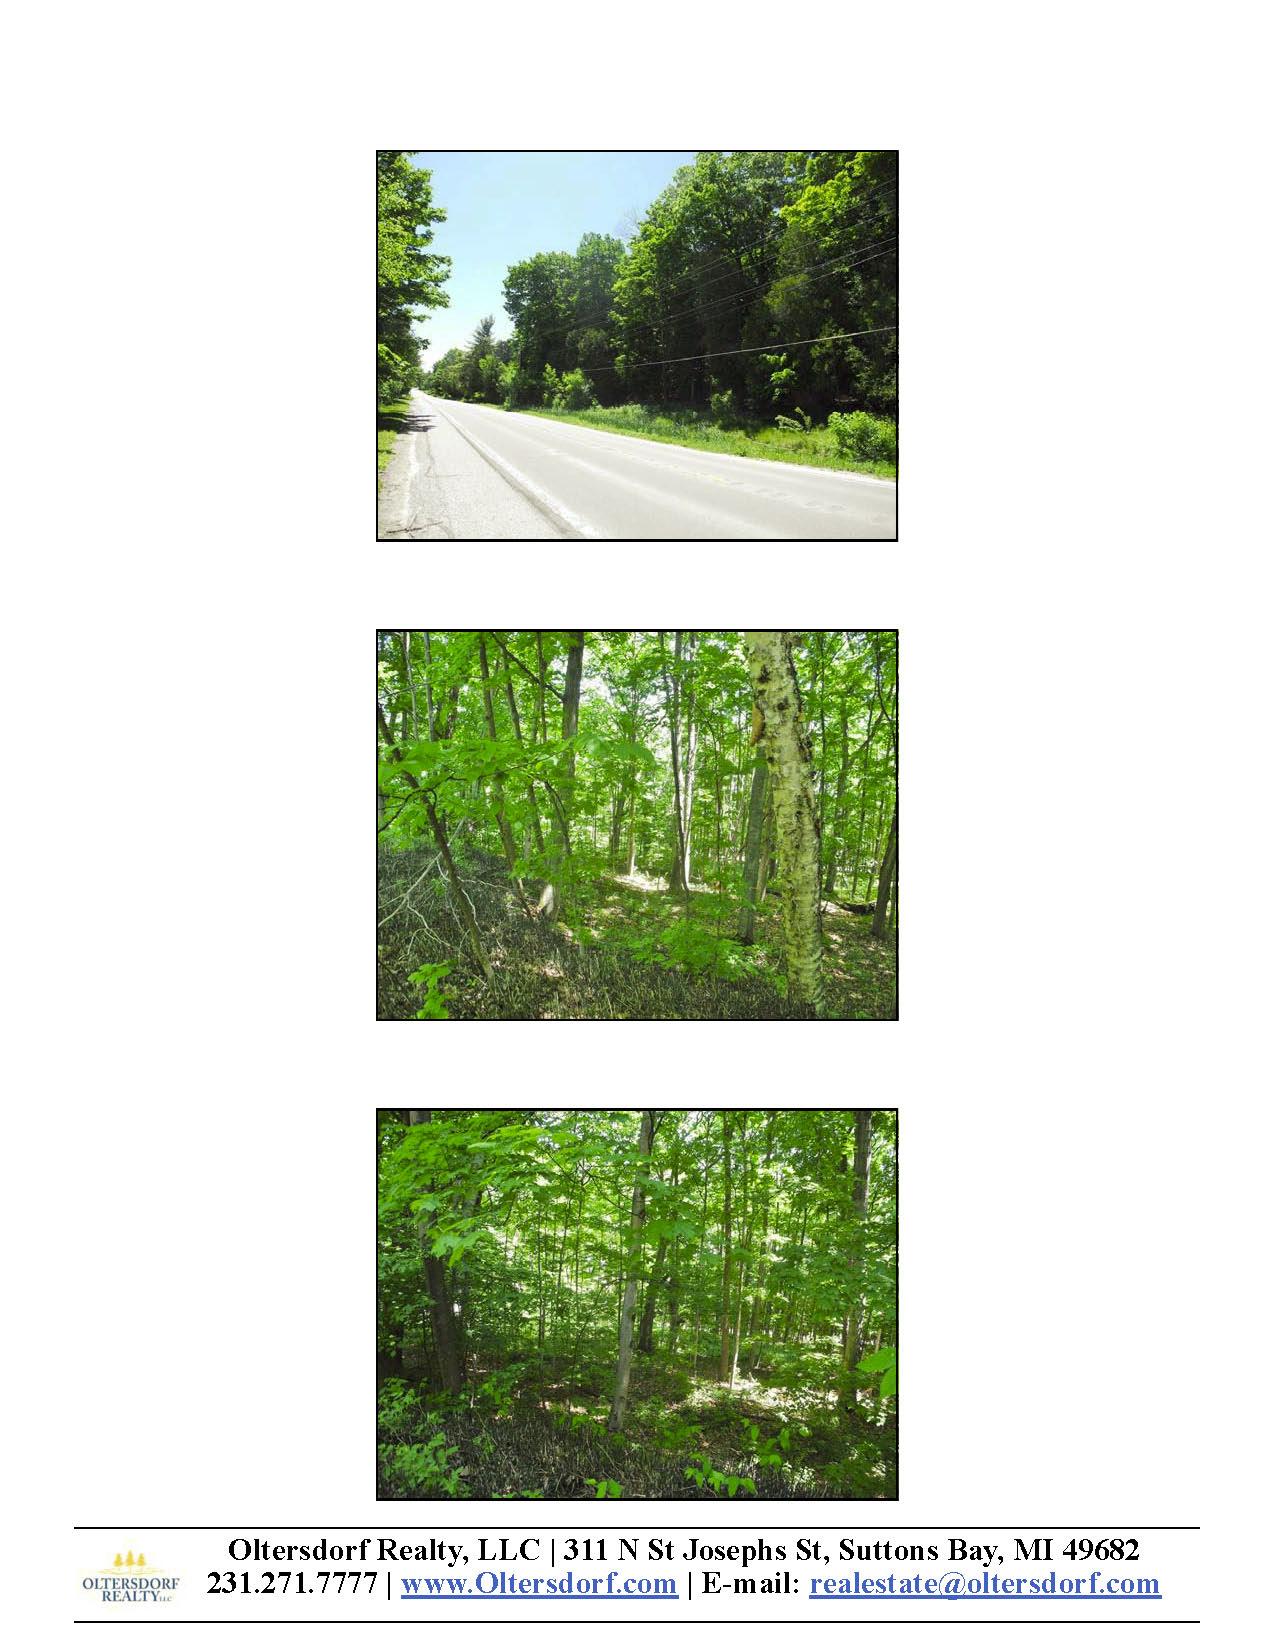 4388 N Manitou Trail, Leland - Marketing packet by Oltersdorf Realty LLC (7).jpg